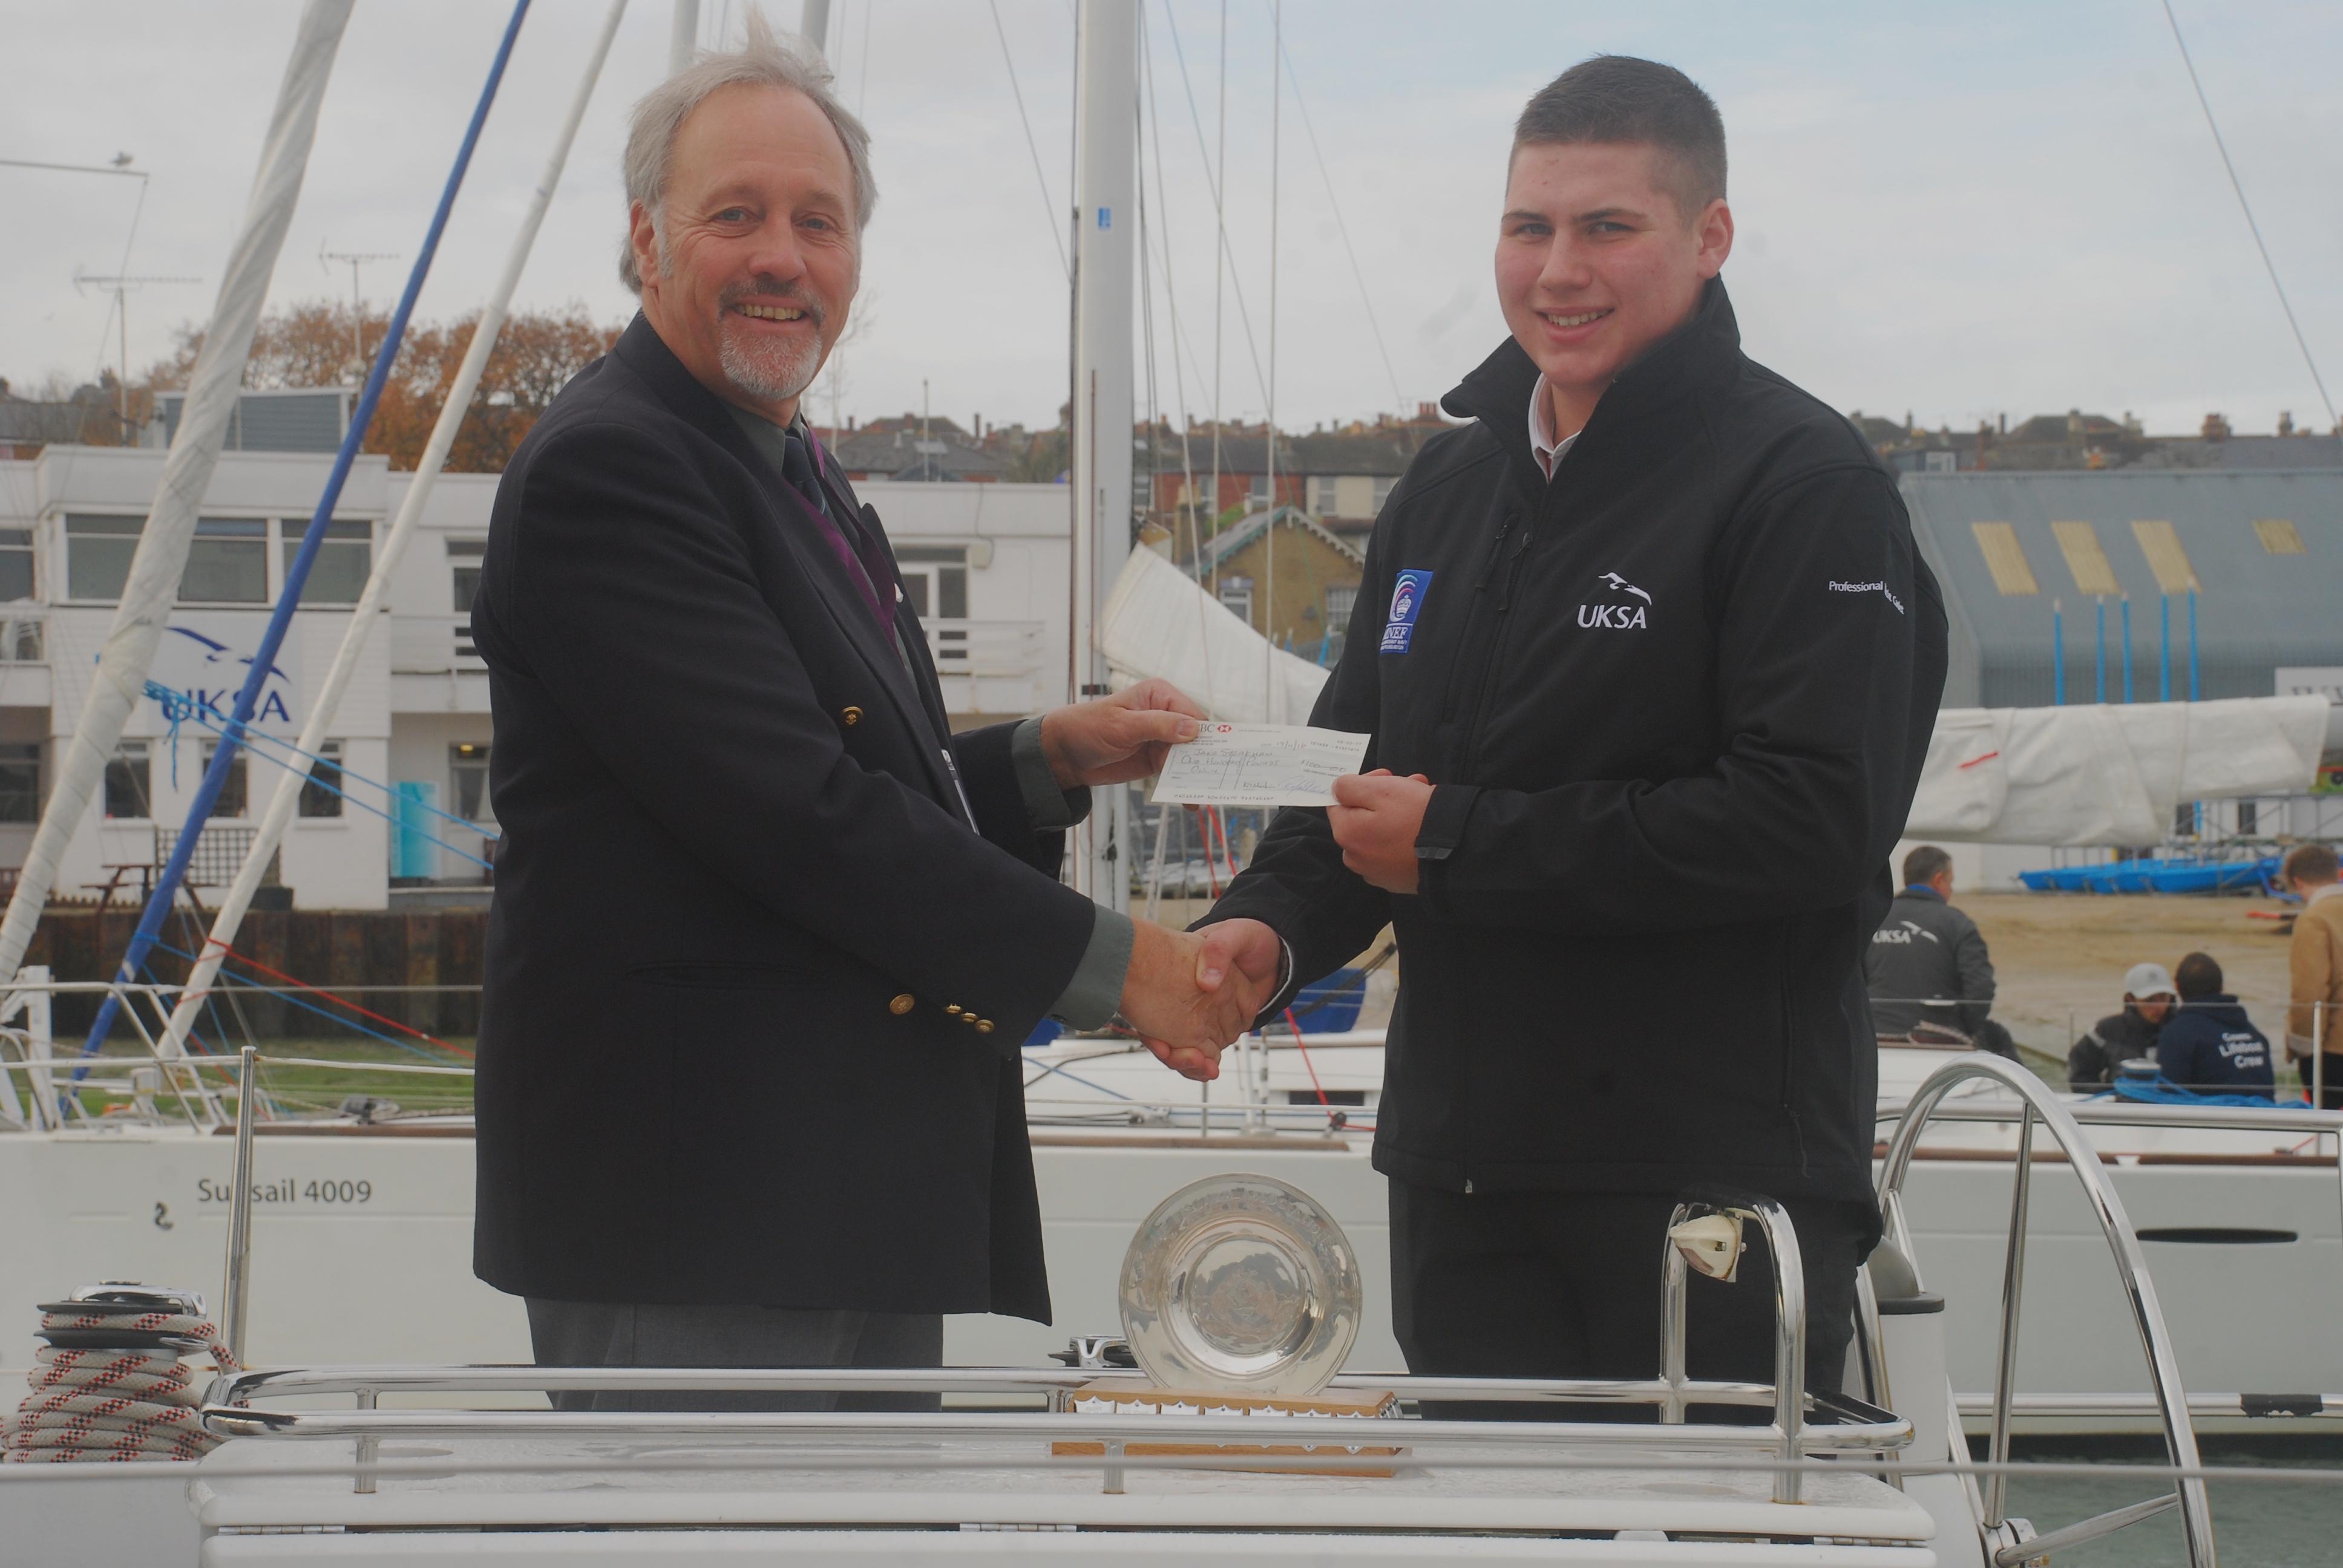 Sea Cadet awarded maritime award by Fisgard Association - UKSA